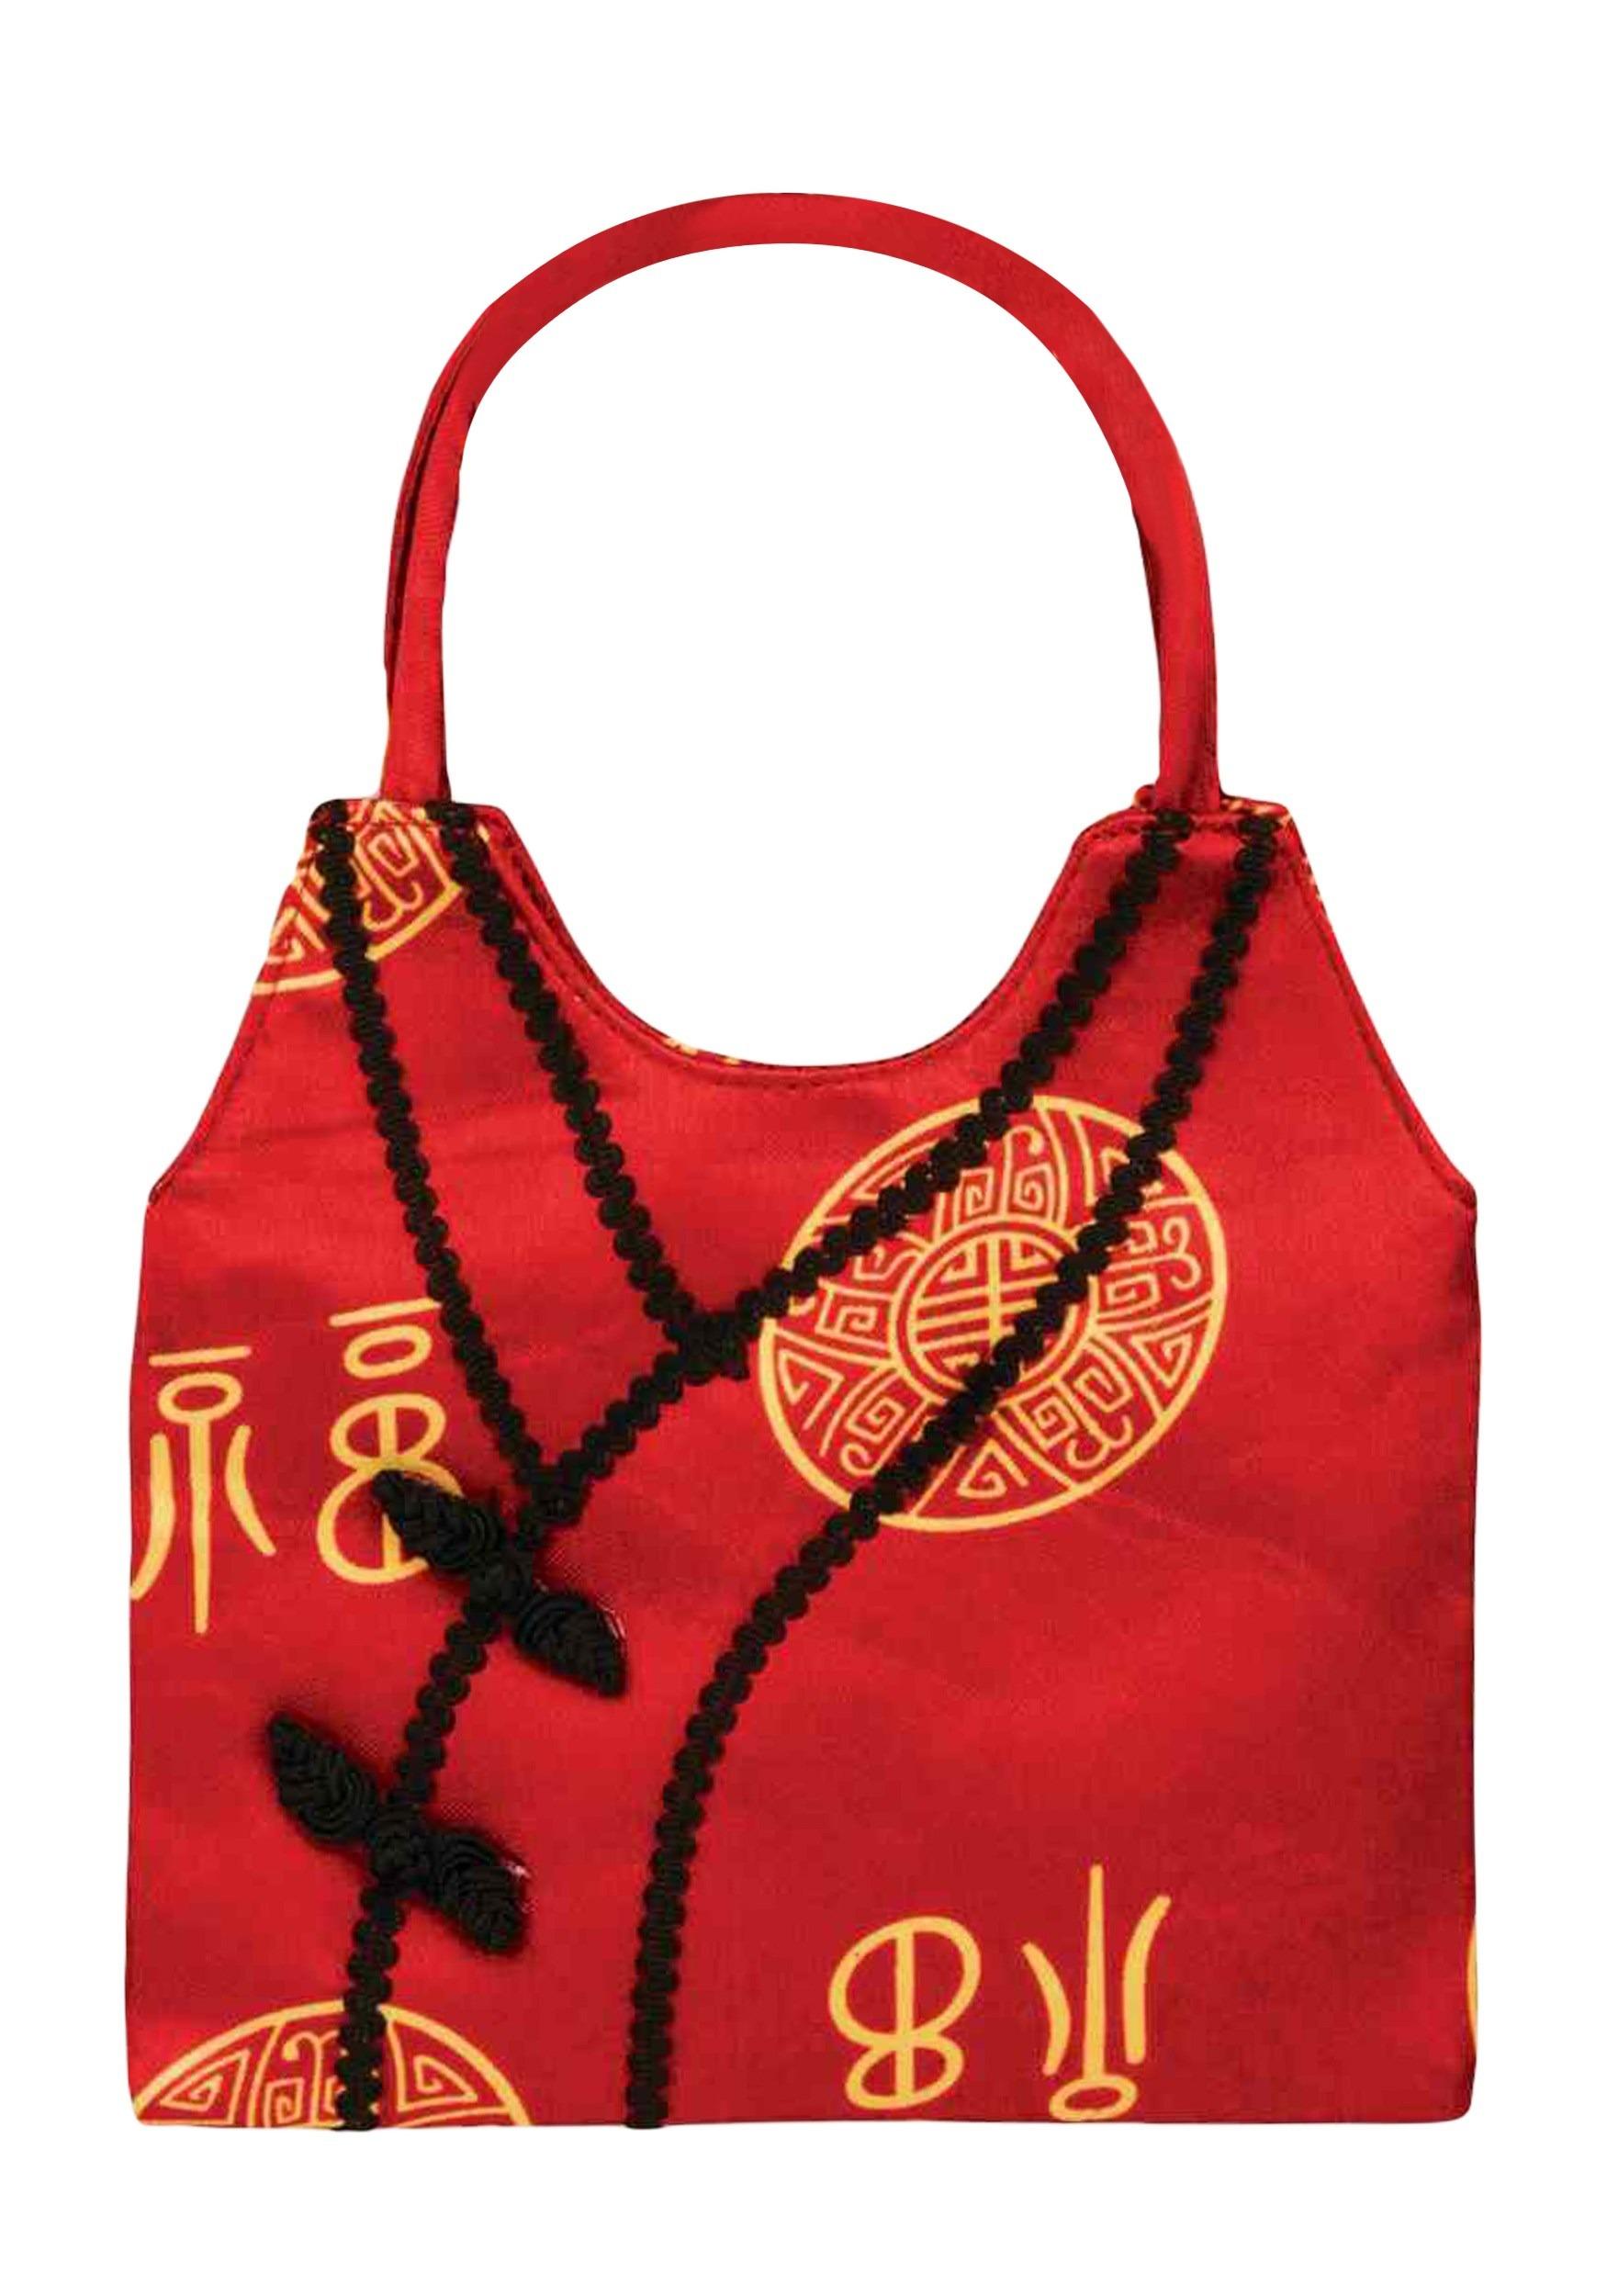 Kimono Handbag Purse (FO61667-ST FO61667) photo